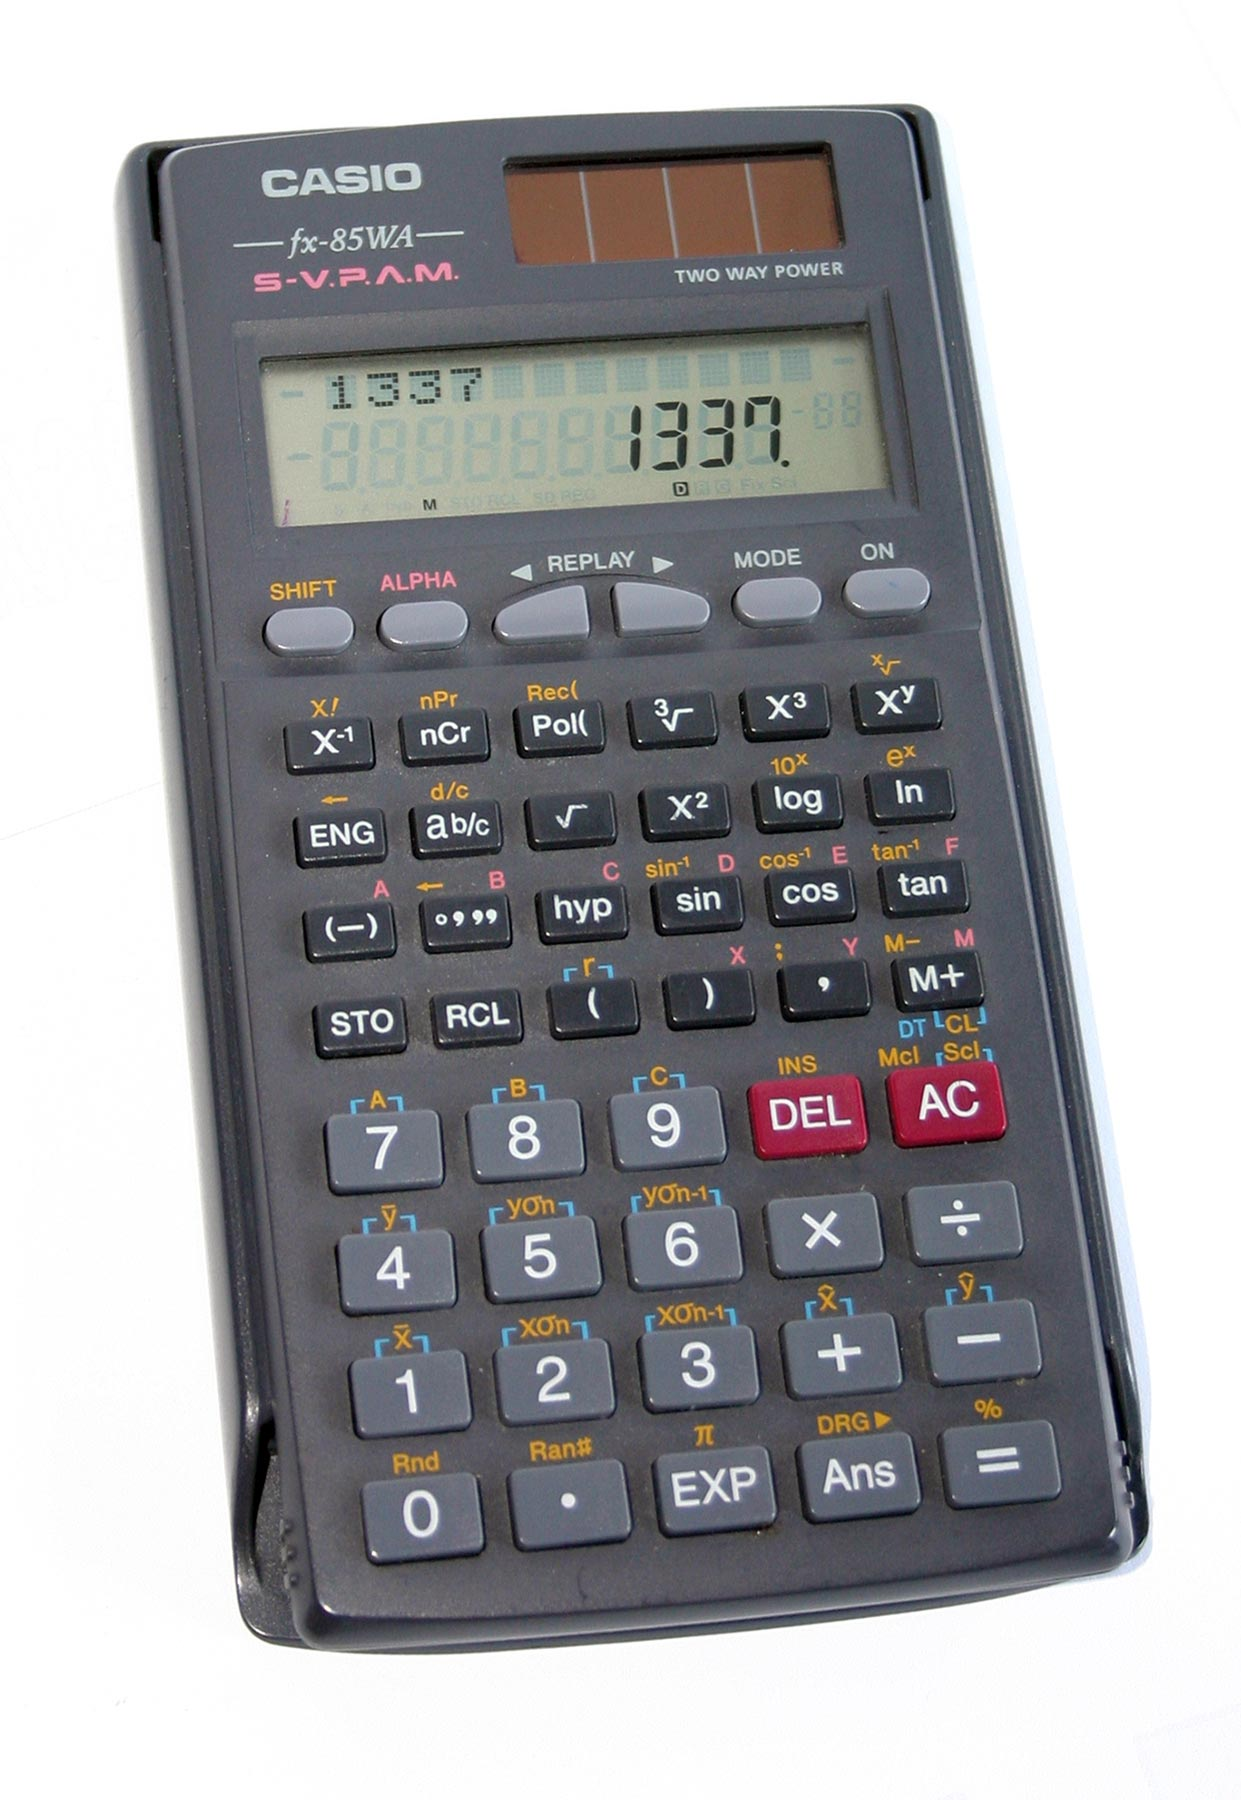 Depiction of Calculadora